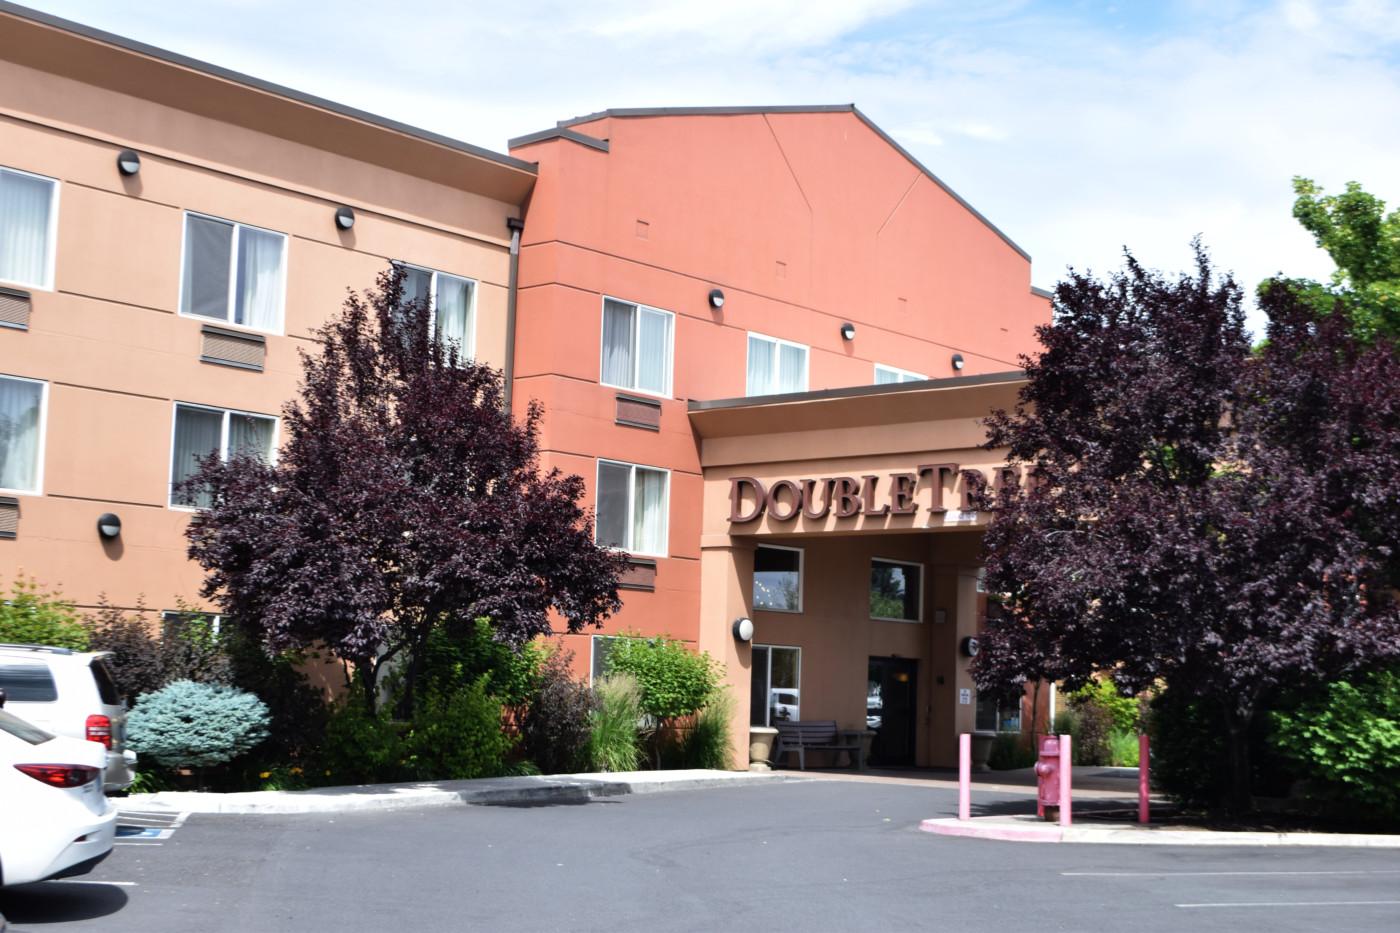 Doubletree Hotel by Hilton in downtown Bend, Oregon.